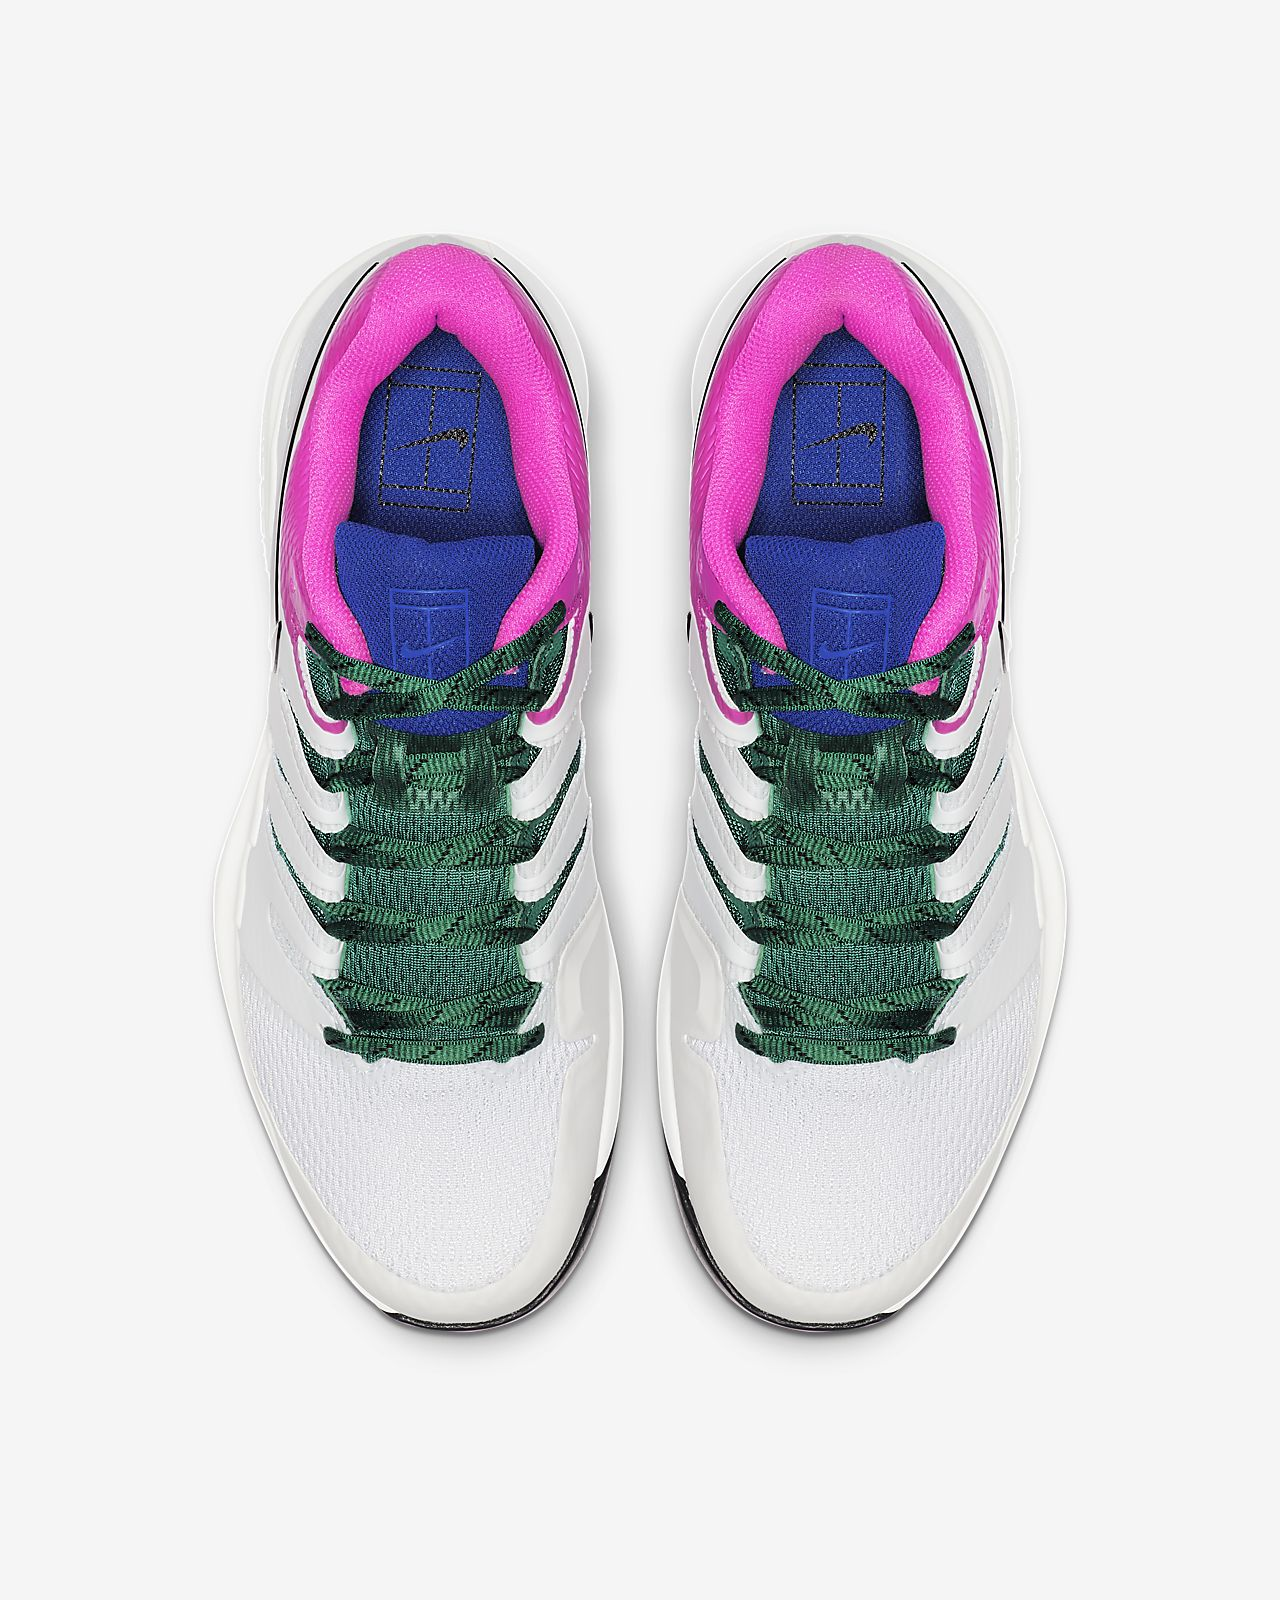 half off 787bf de7f6 ... NikeCourt Air Zoom Vapor X Mens Hard Court Tennis Shoe